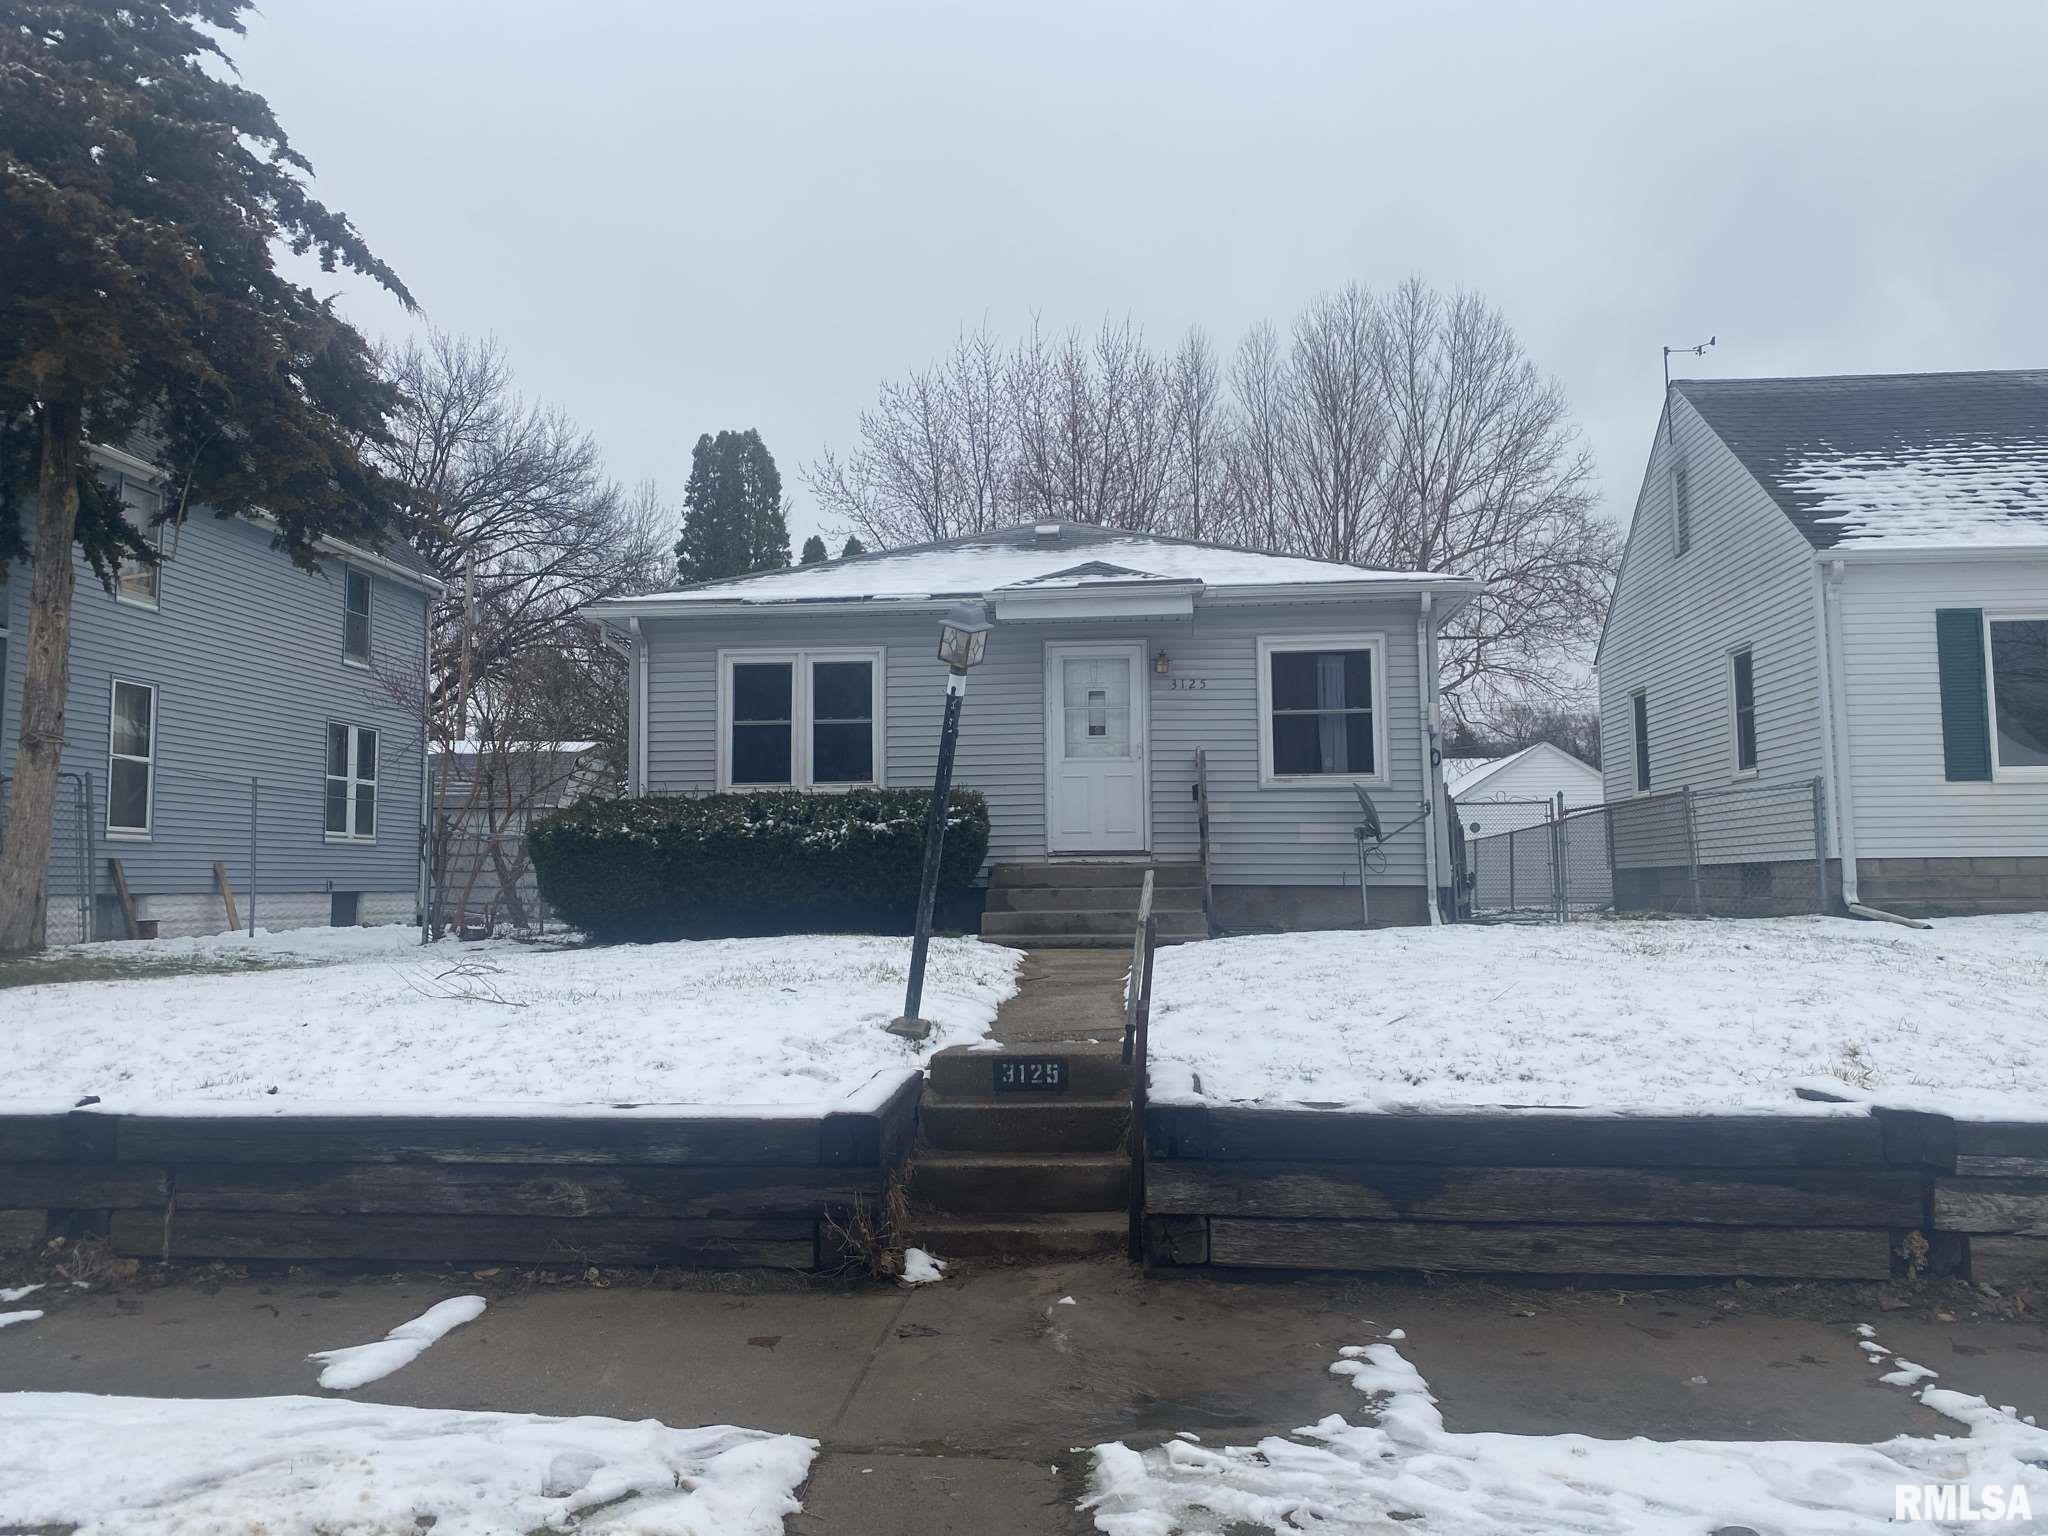 594 20TH Property Photo - Rock Island, IL real estate listing